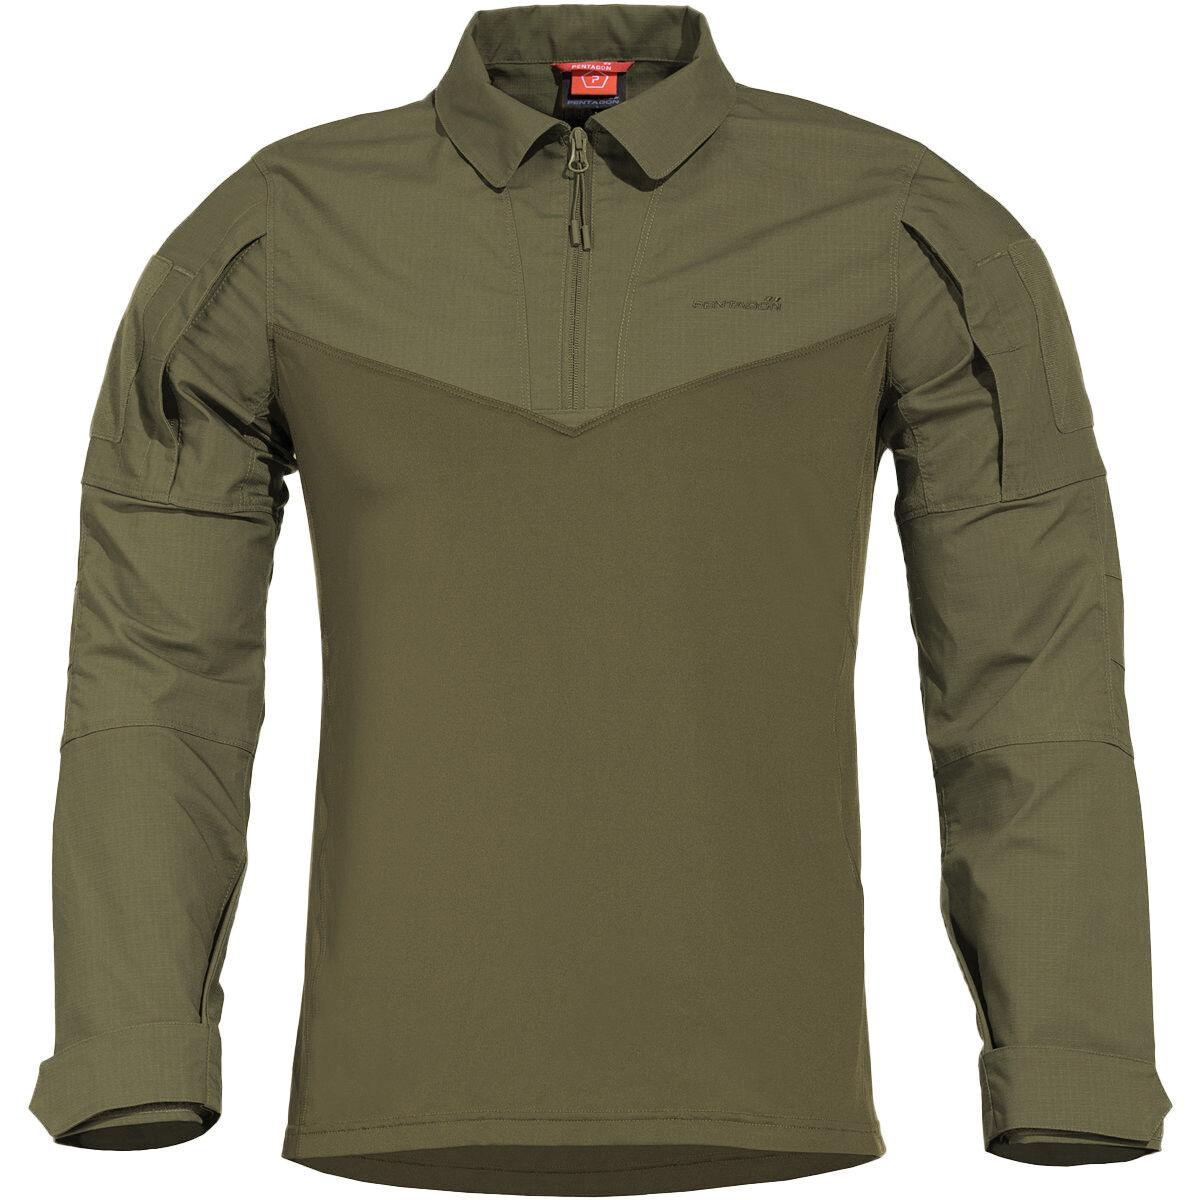 Pentagon Ranger Tac-Fresh Camicia Uomo Militare Softair Tattico Ranger verde